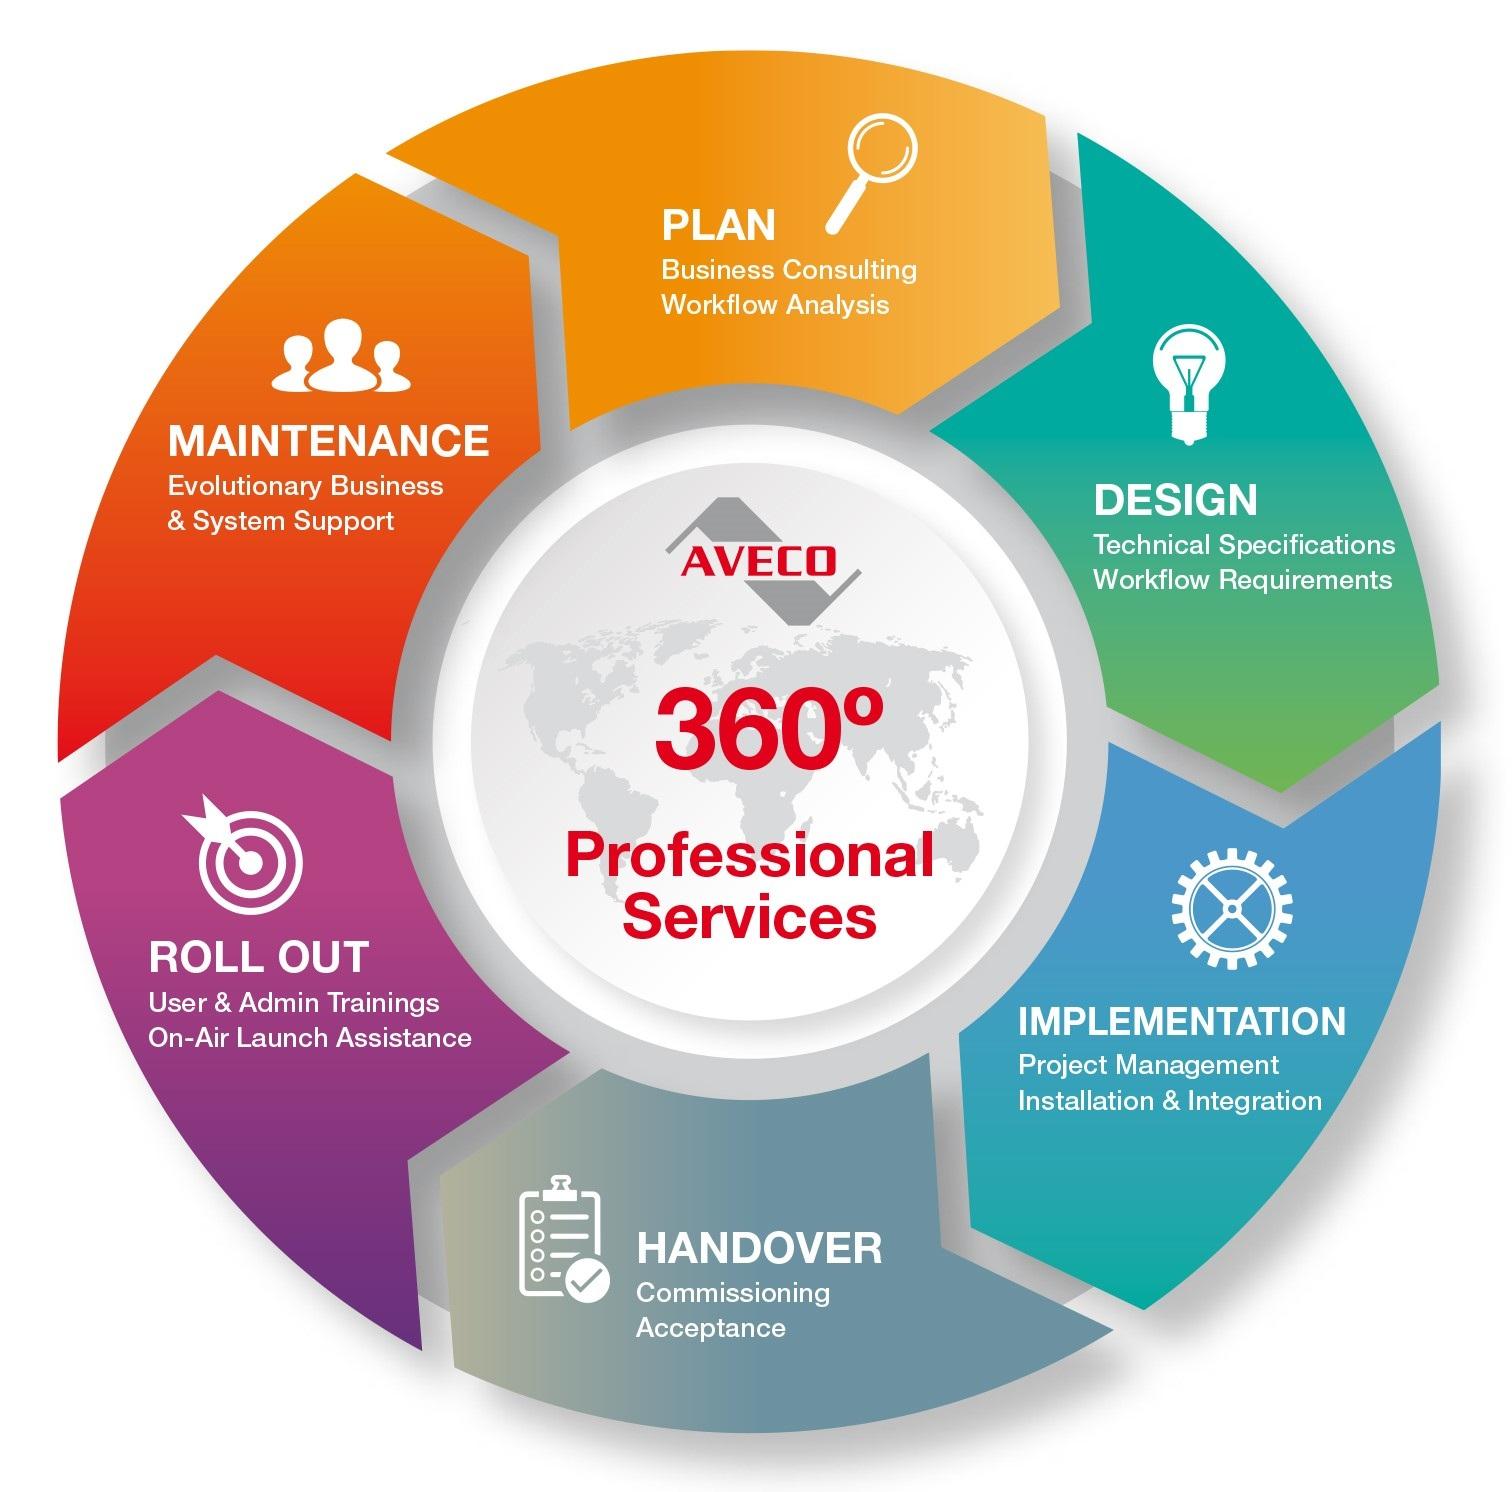 Professional Services Aveco